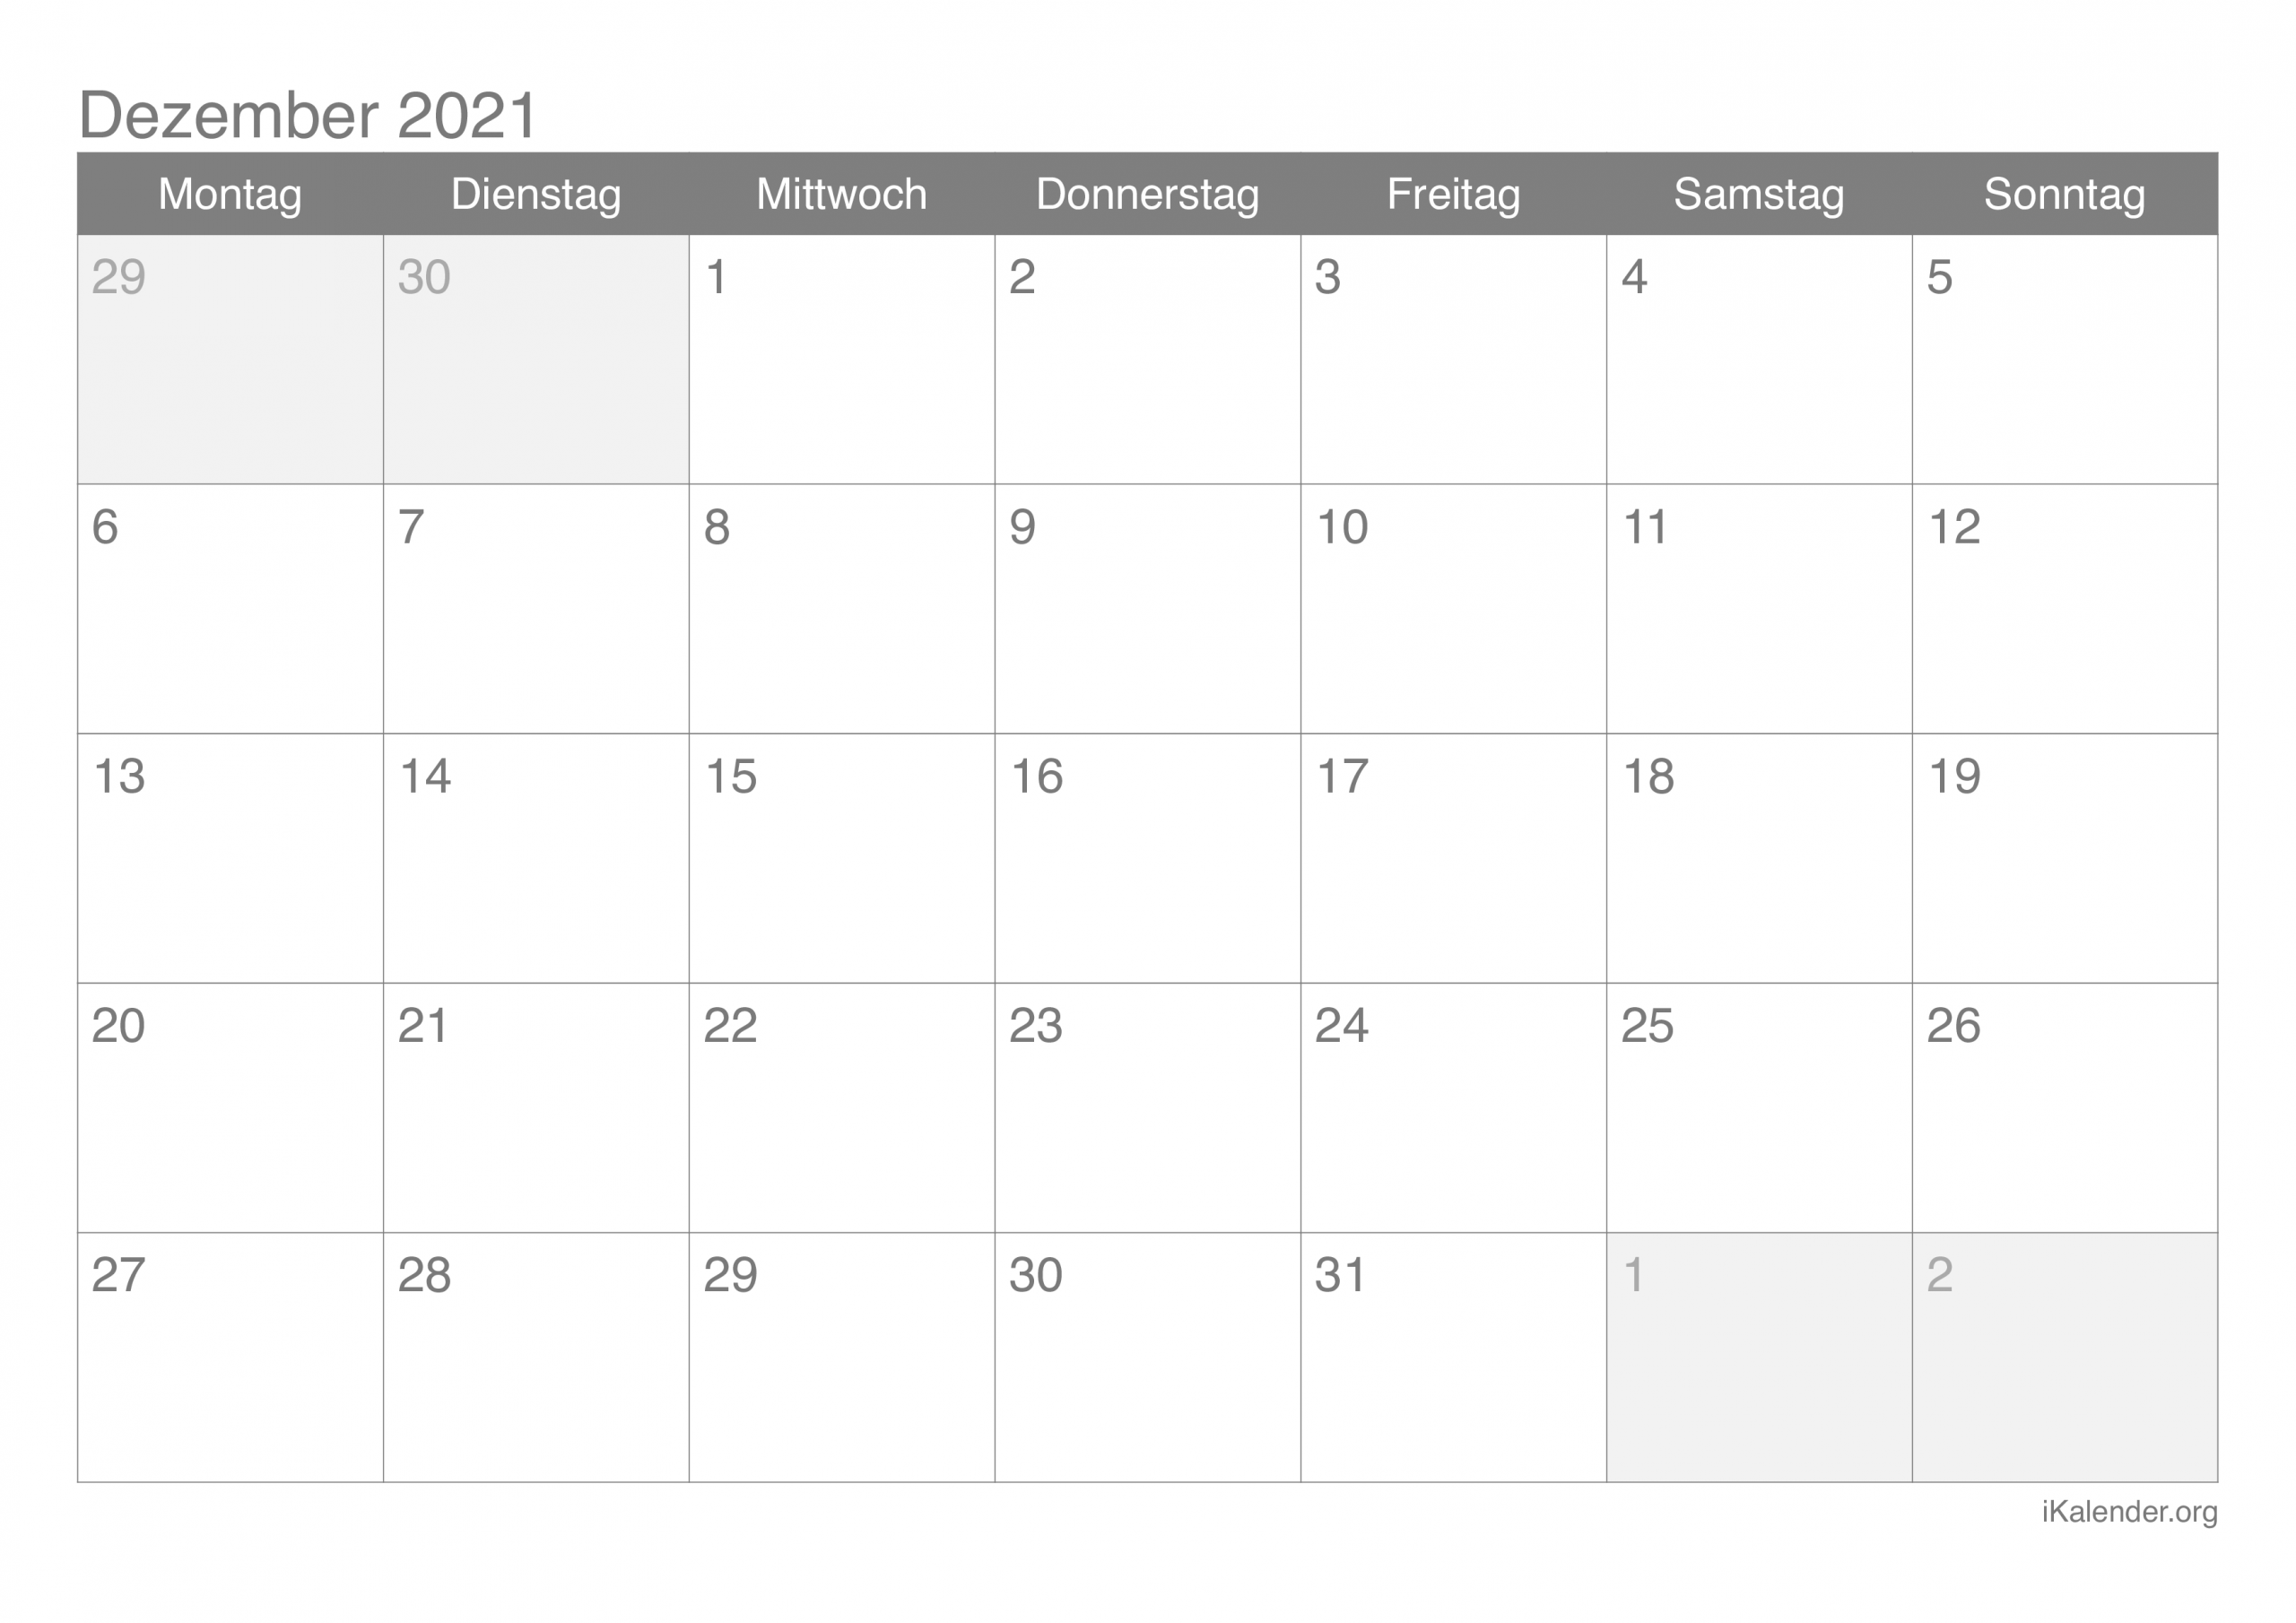 Collect Kalender Dezember 2021 Zum Ausdrucken